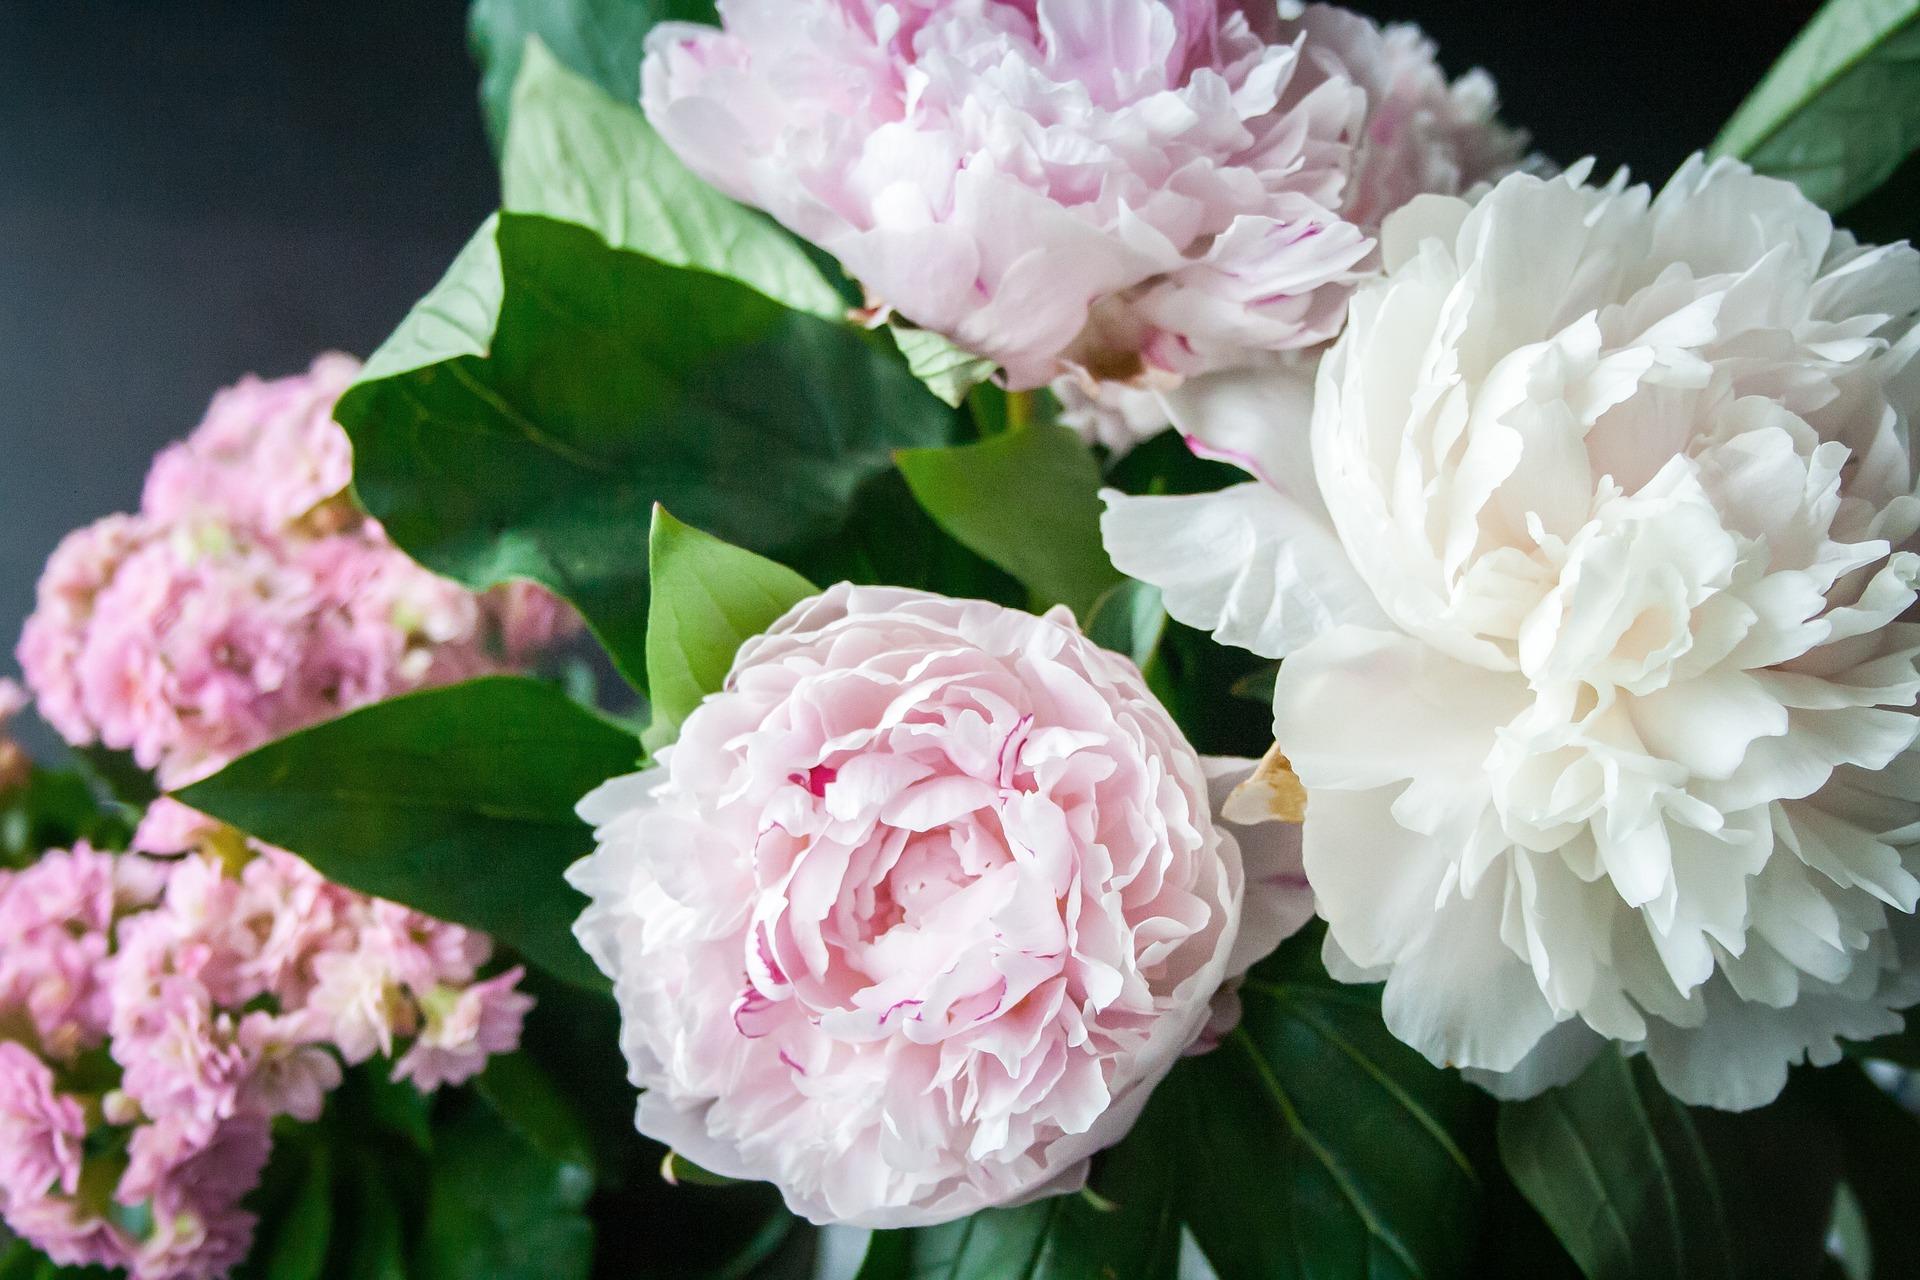 flores arbusto peonias